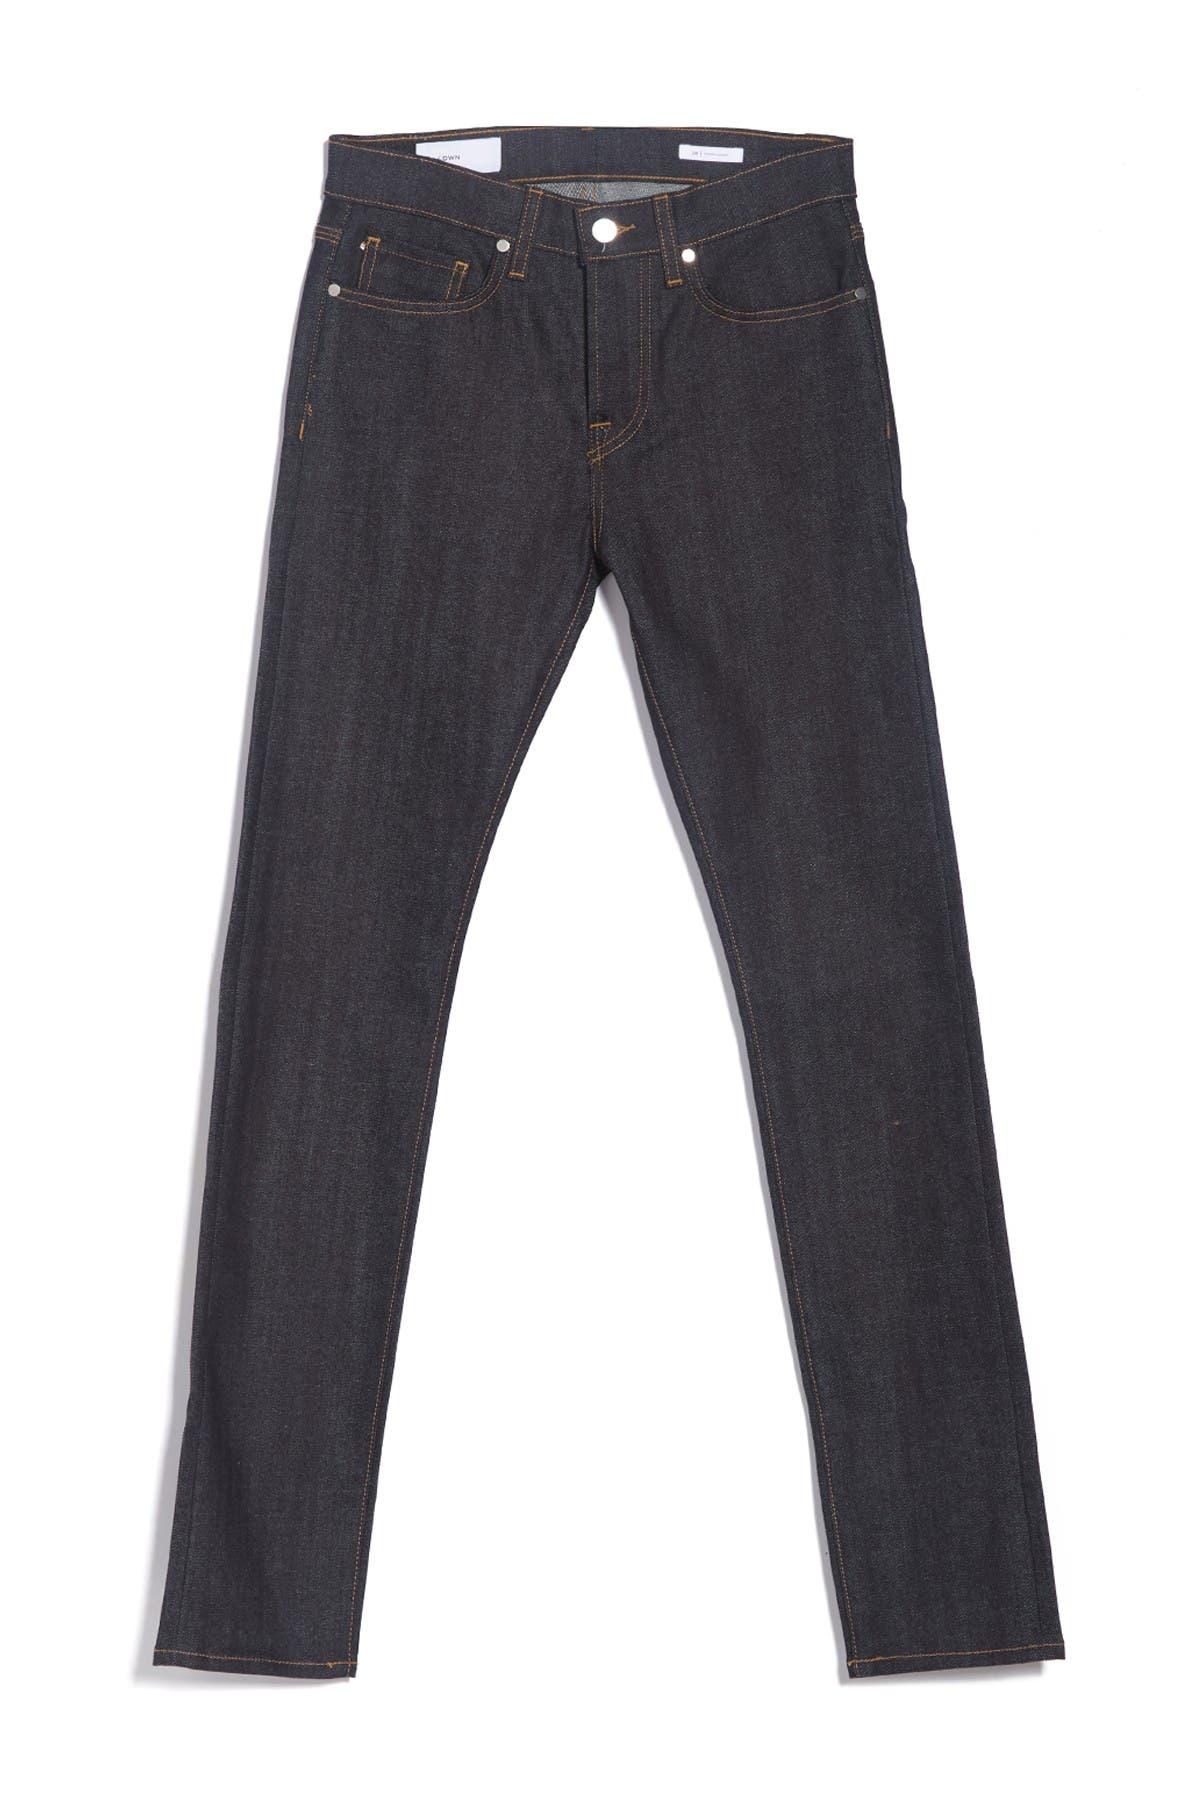 Image of BALDWIN Modern Slim Fit Jeans